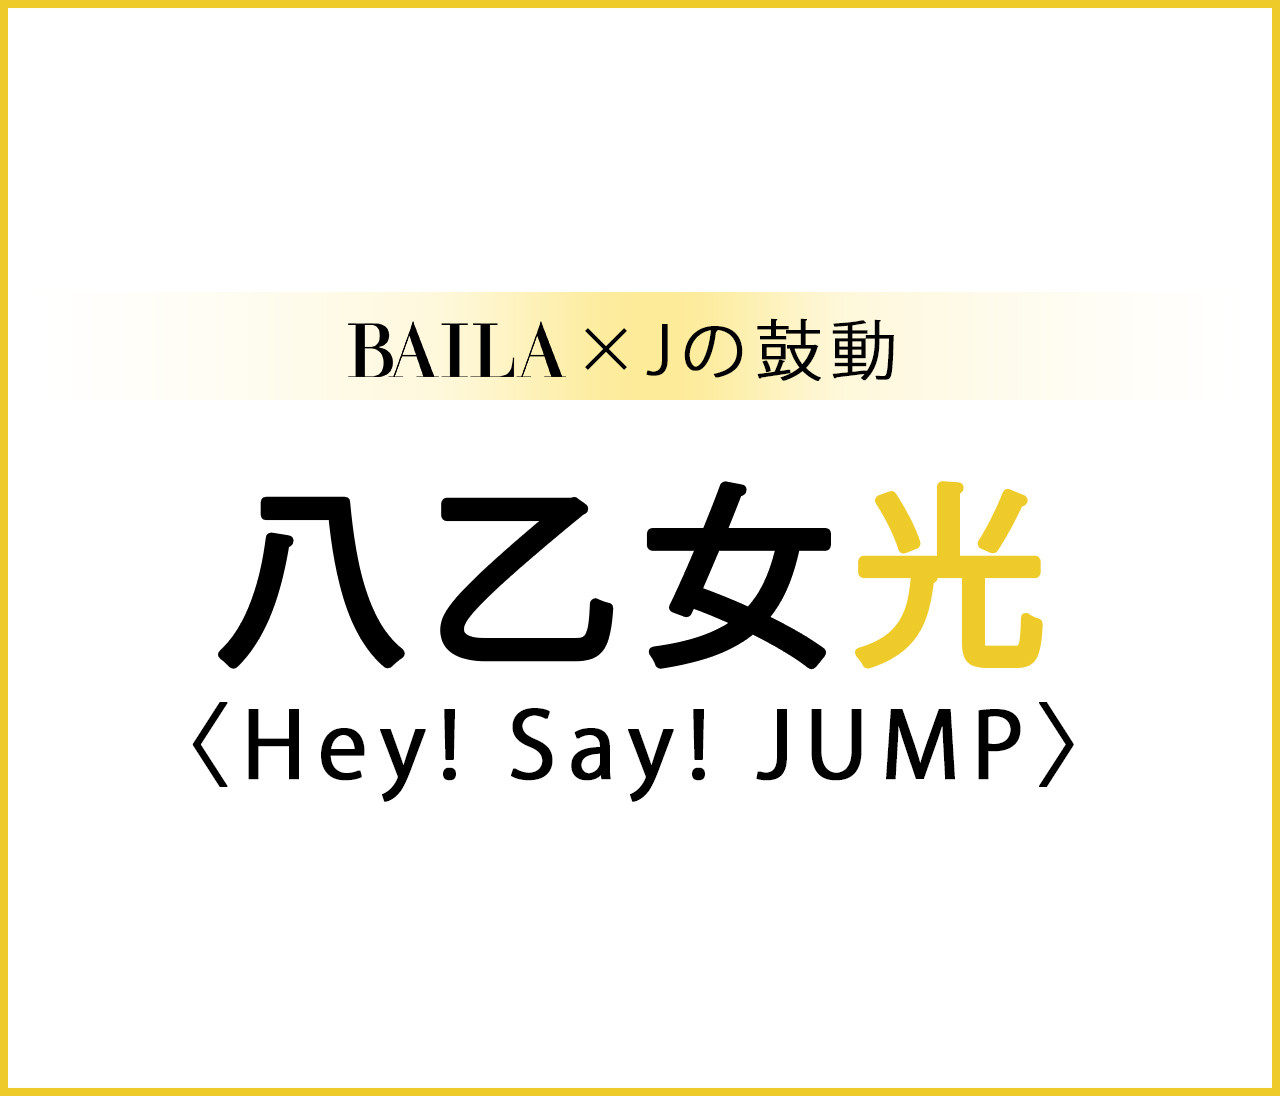 【 #HeySayJUMP #八乙女光 】Hey! Say! JUMP 八乙女光スペシャルインタビュー!【BAILA × Jの鼓動】